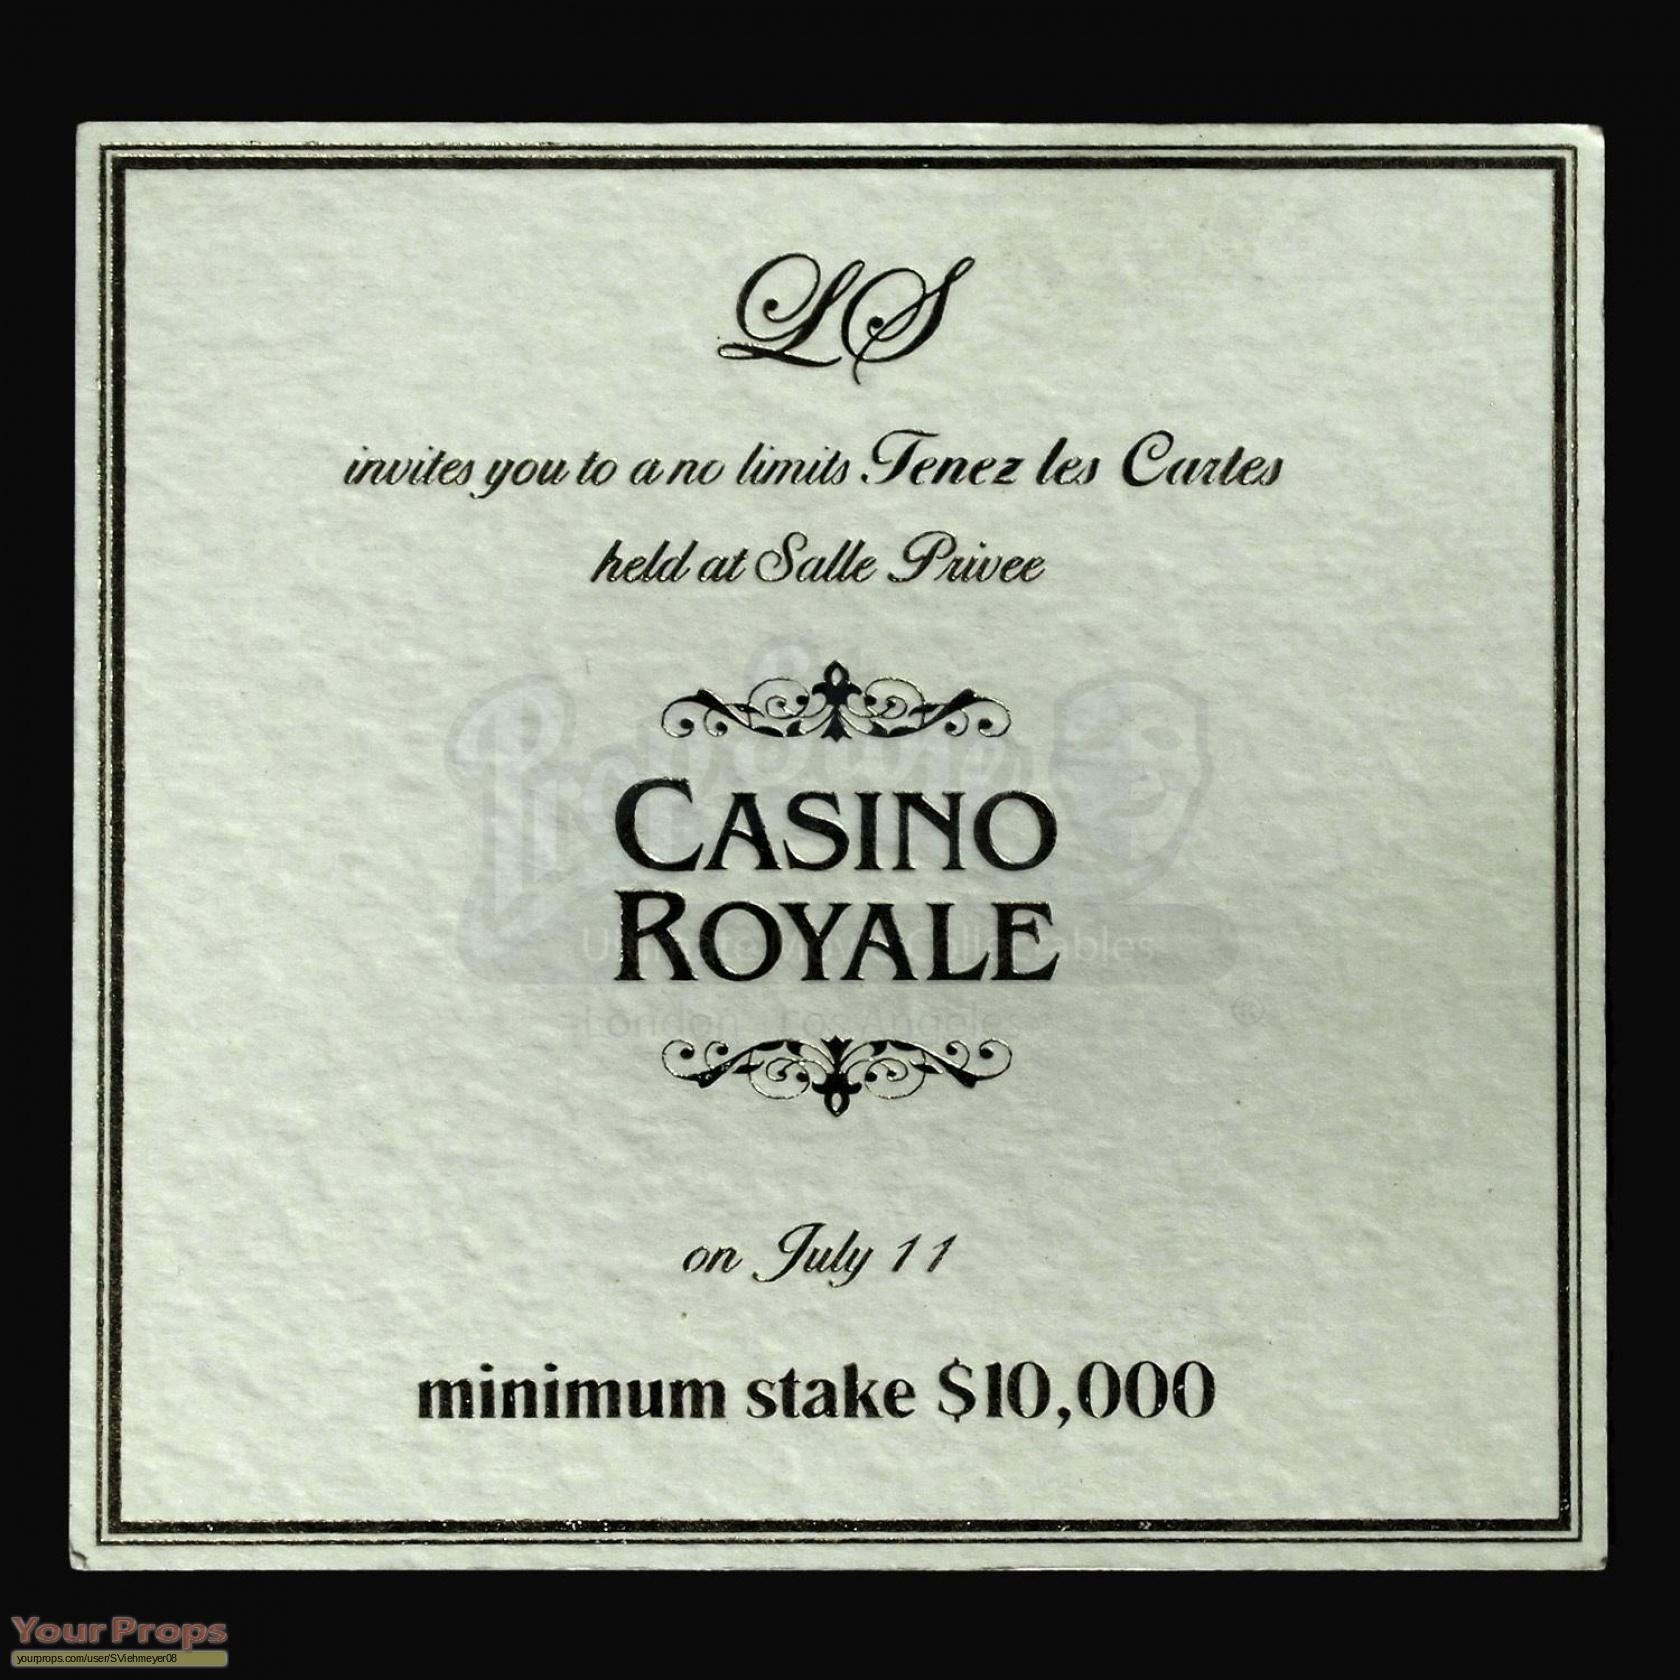 James bond casino royale poker invitation original movie prop james bond casino royale original movie prop stopboris Images